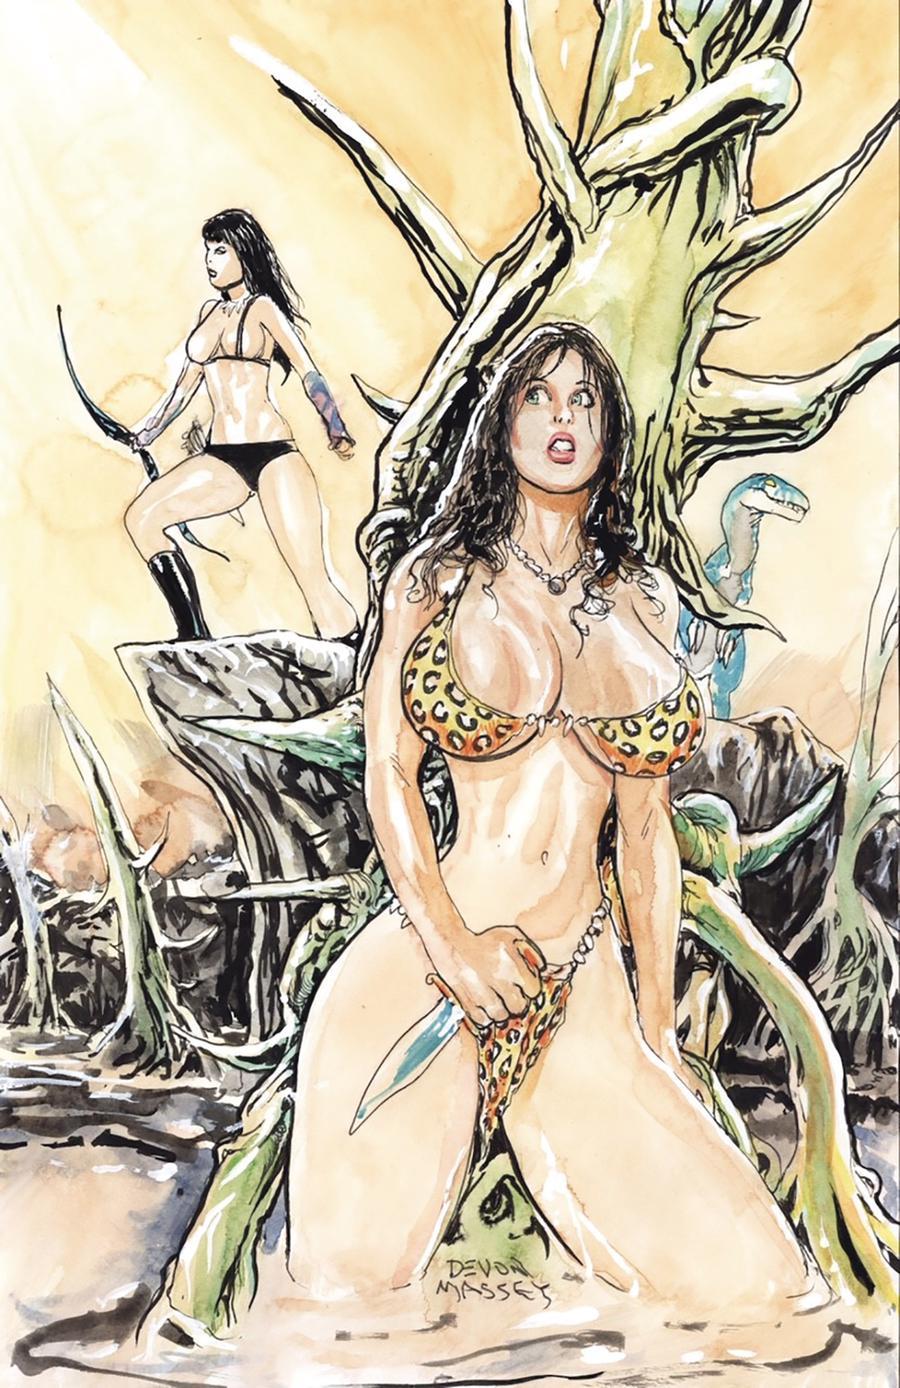 Cavewoman Raptorellas Revenge #2 Cover A Regular Devon Massey Cover